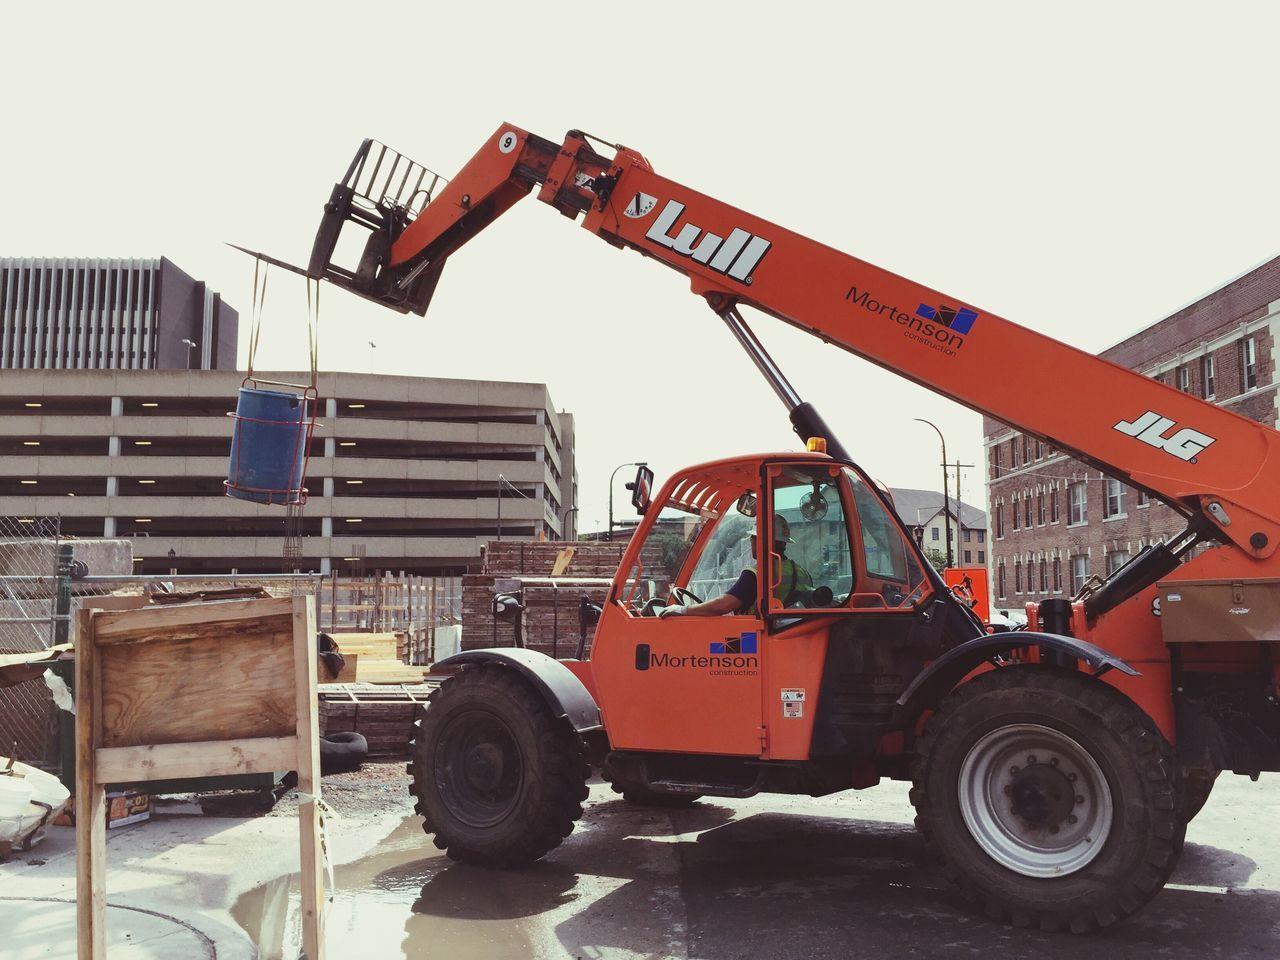 Heavy Equipment Constructionequipment Construction Crane Construction Materials Urbanphotography Streetphotography Puddle Reflections Trash Dumpster HardHats Hardwork Construction Construction Site Minnesota Minneapolis Minnesotaphotographer